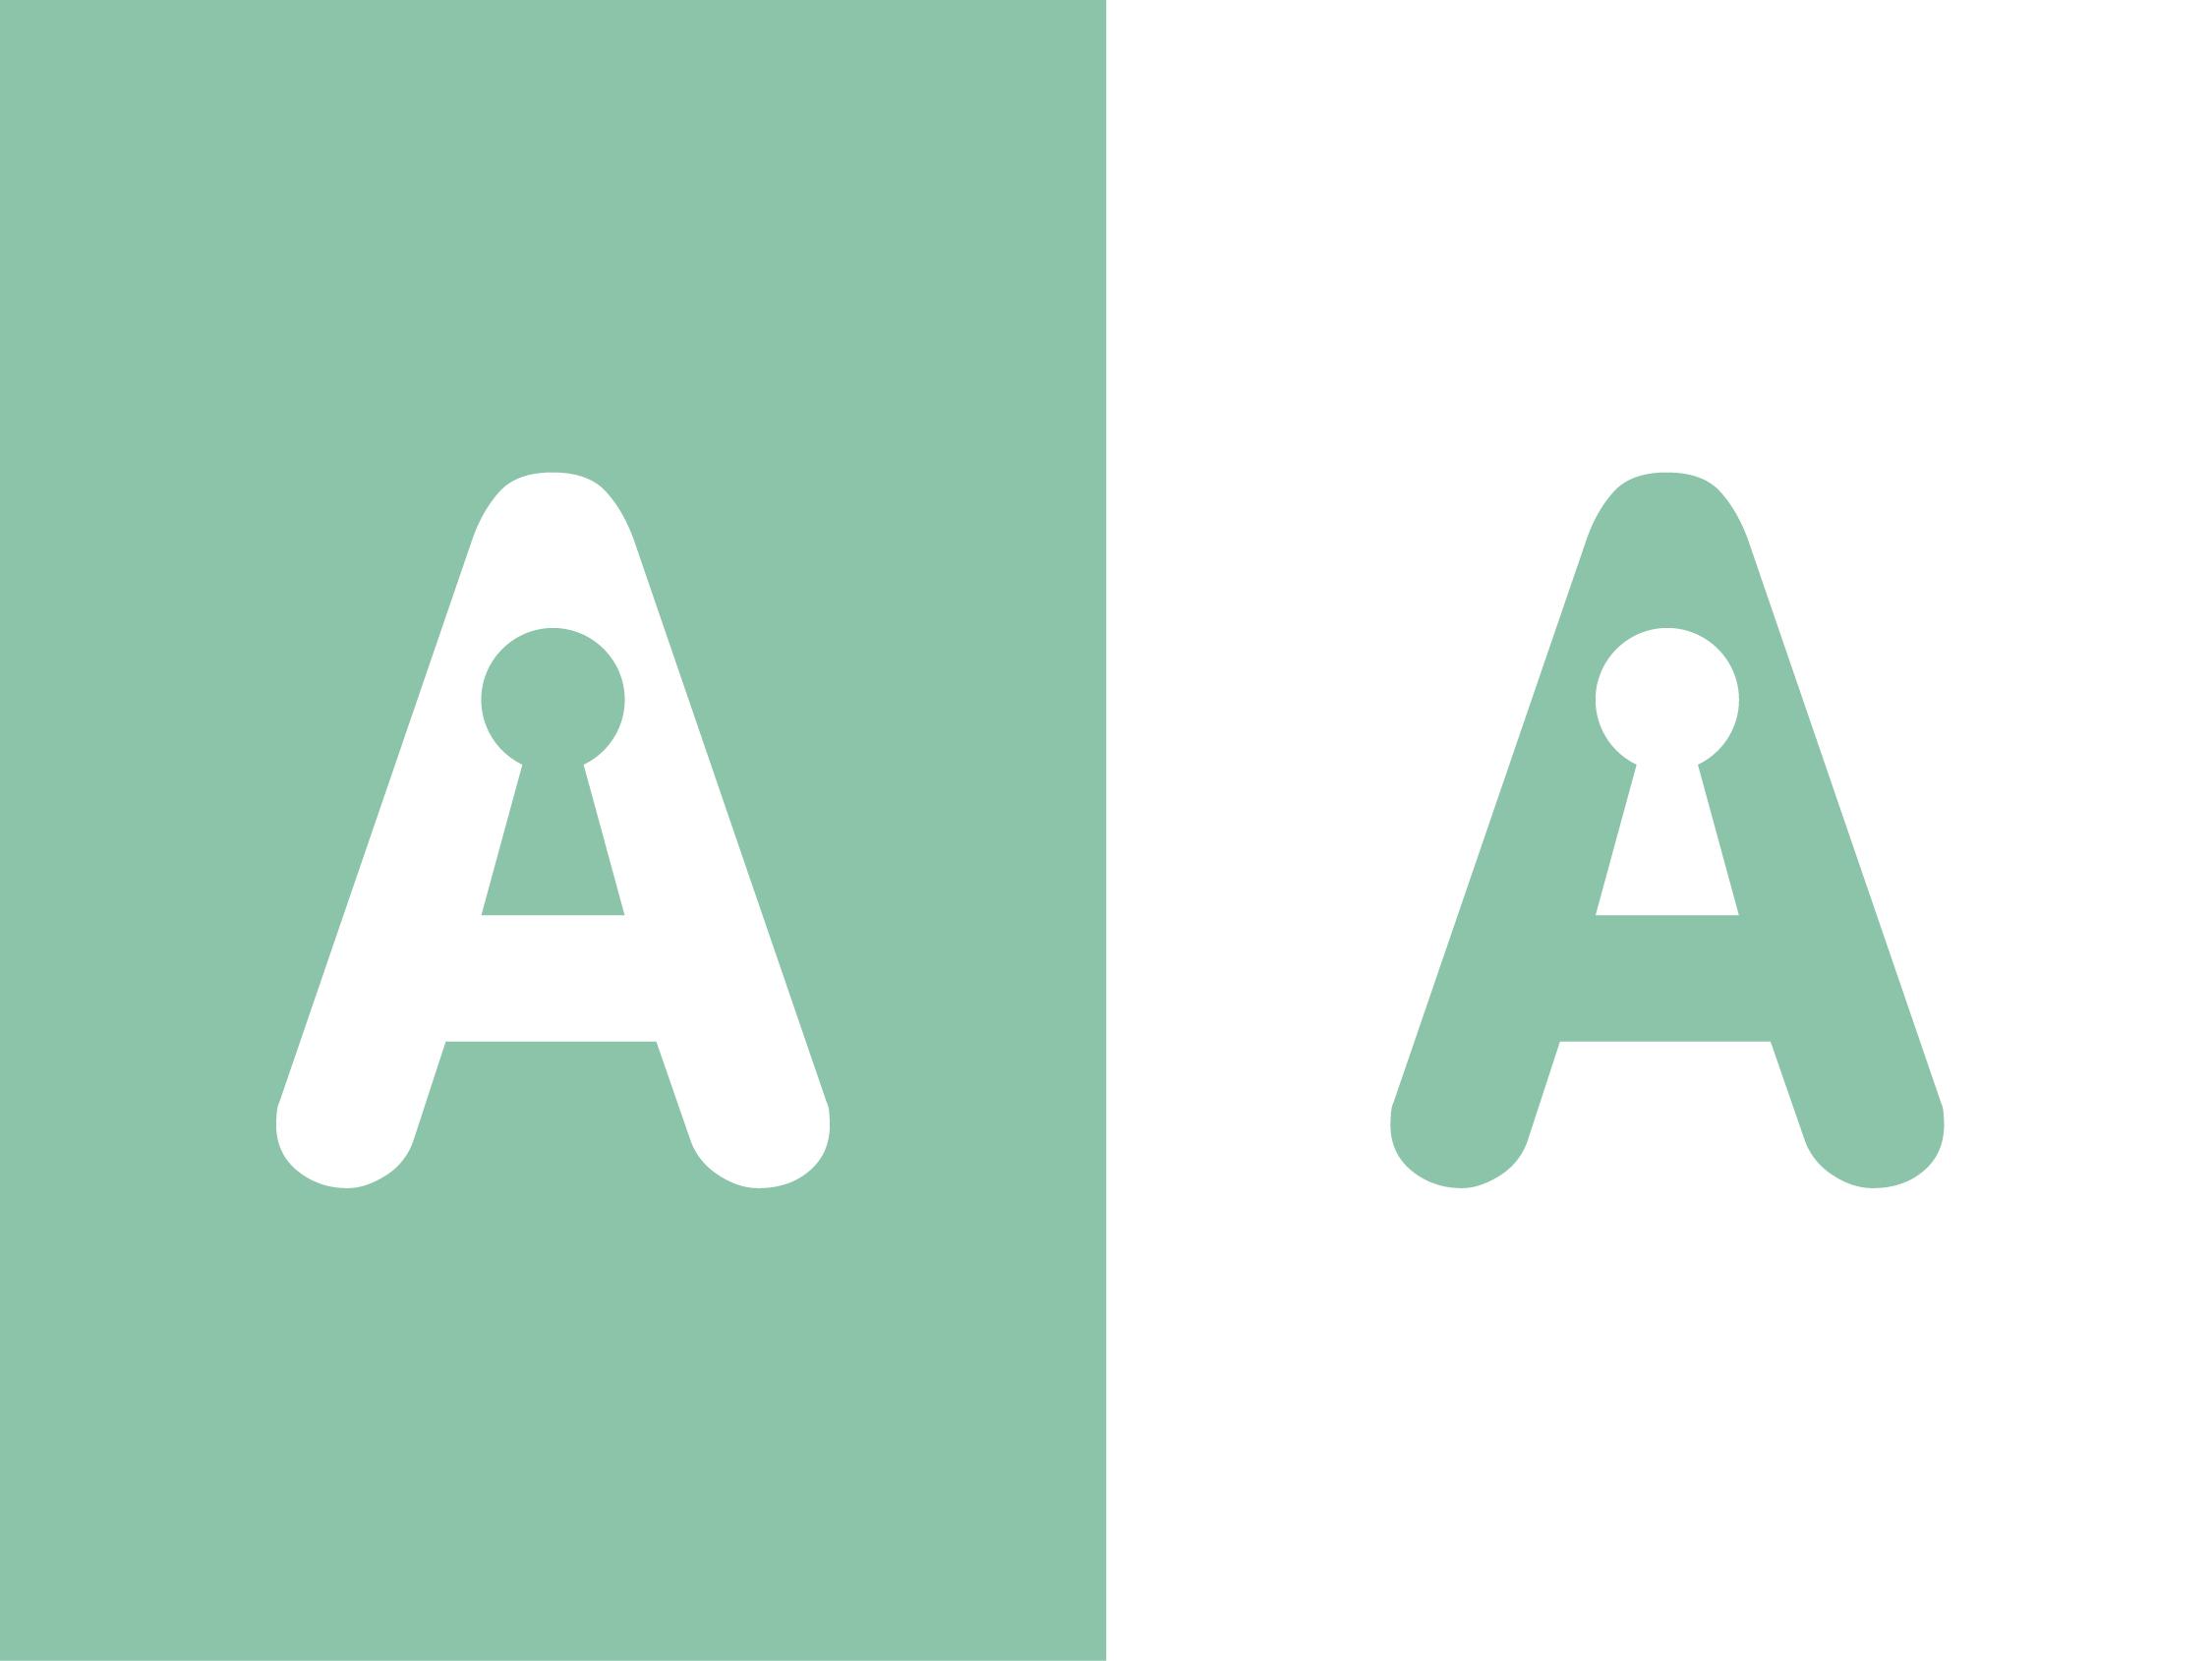 Osteopathie_Harmelink_XAdesign_Xander_Abbink_Logo_huisstijl-detail-A